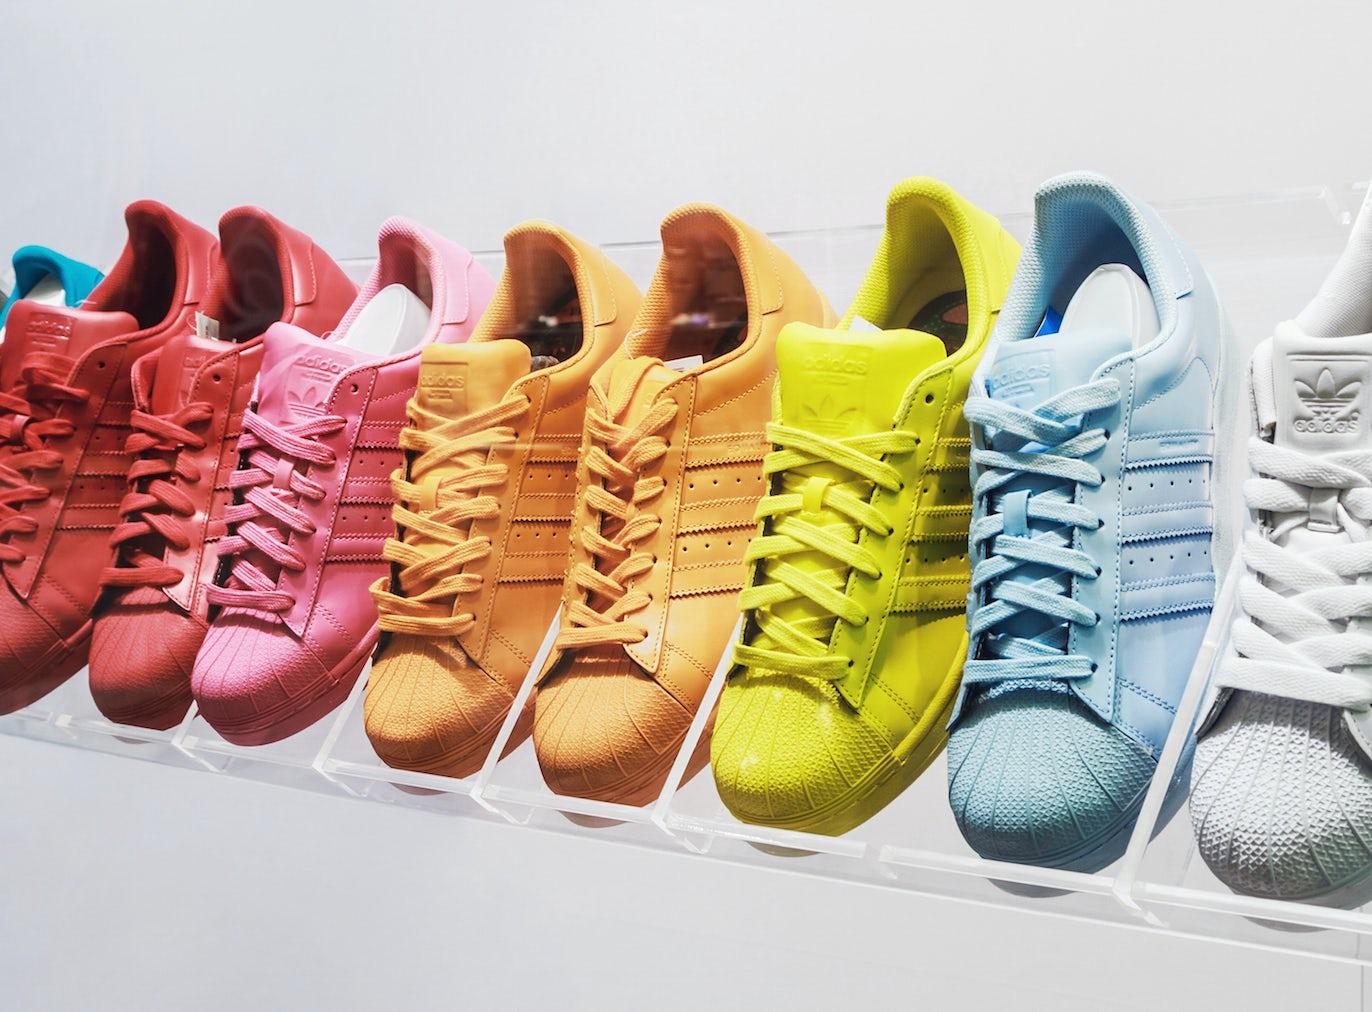 Adidas Superstar sneakers | Source: Shutterstock